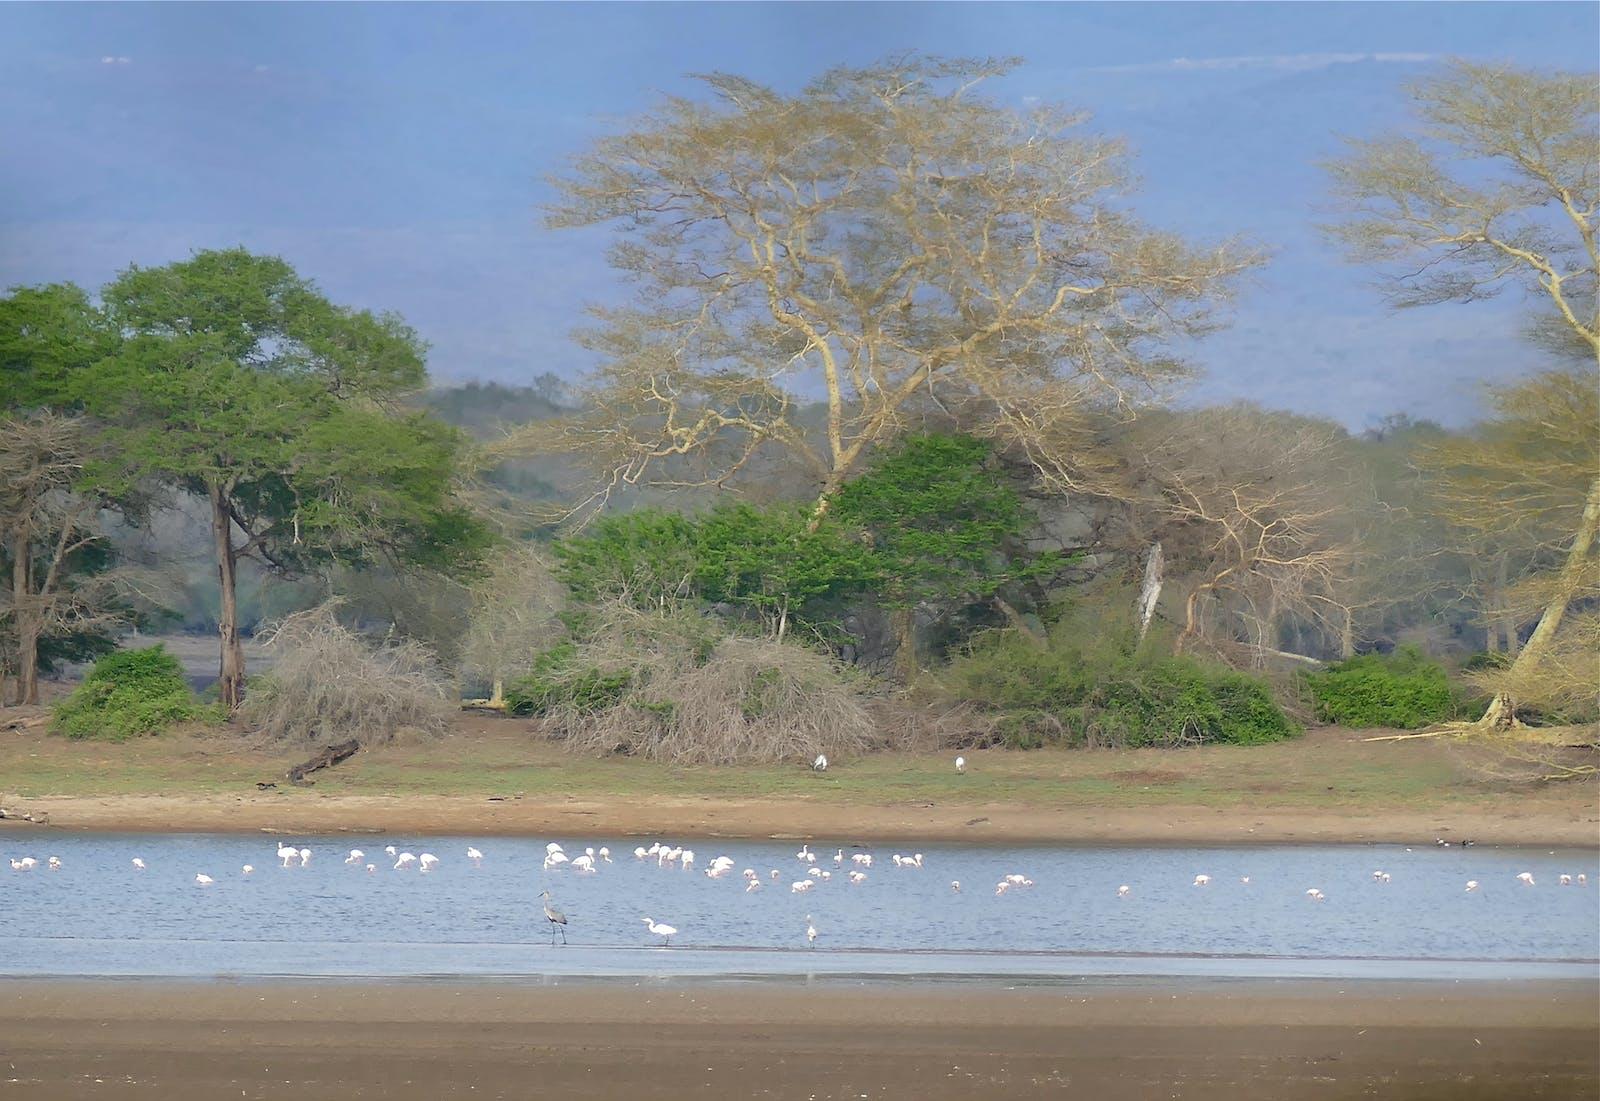 Maputaland Coastal Forests and Woodlands